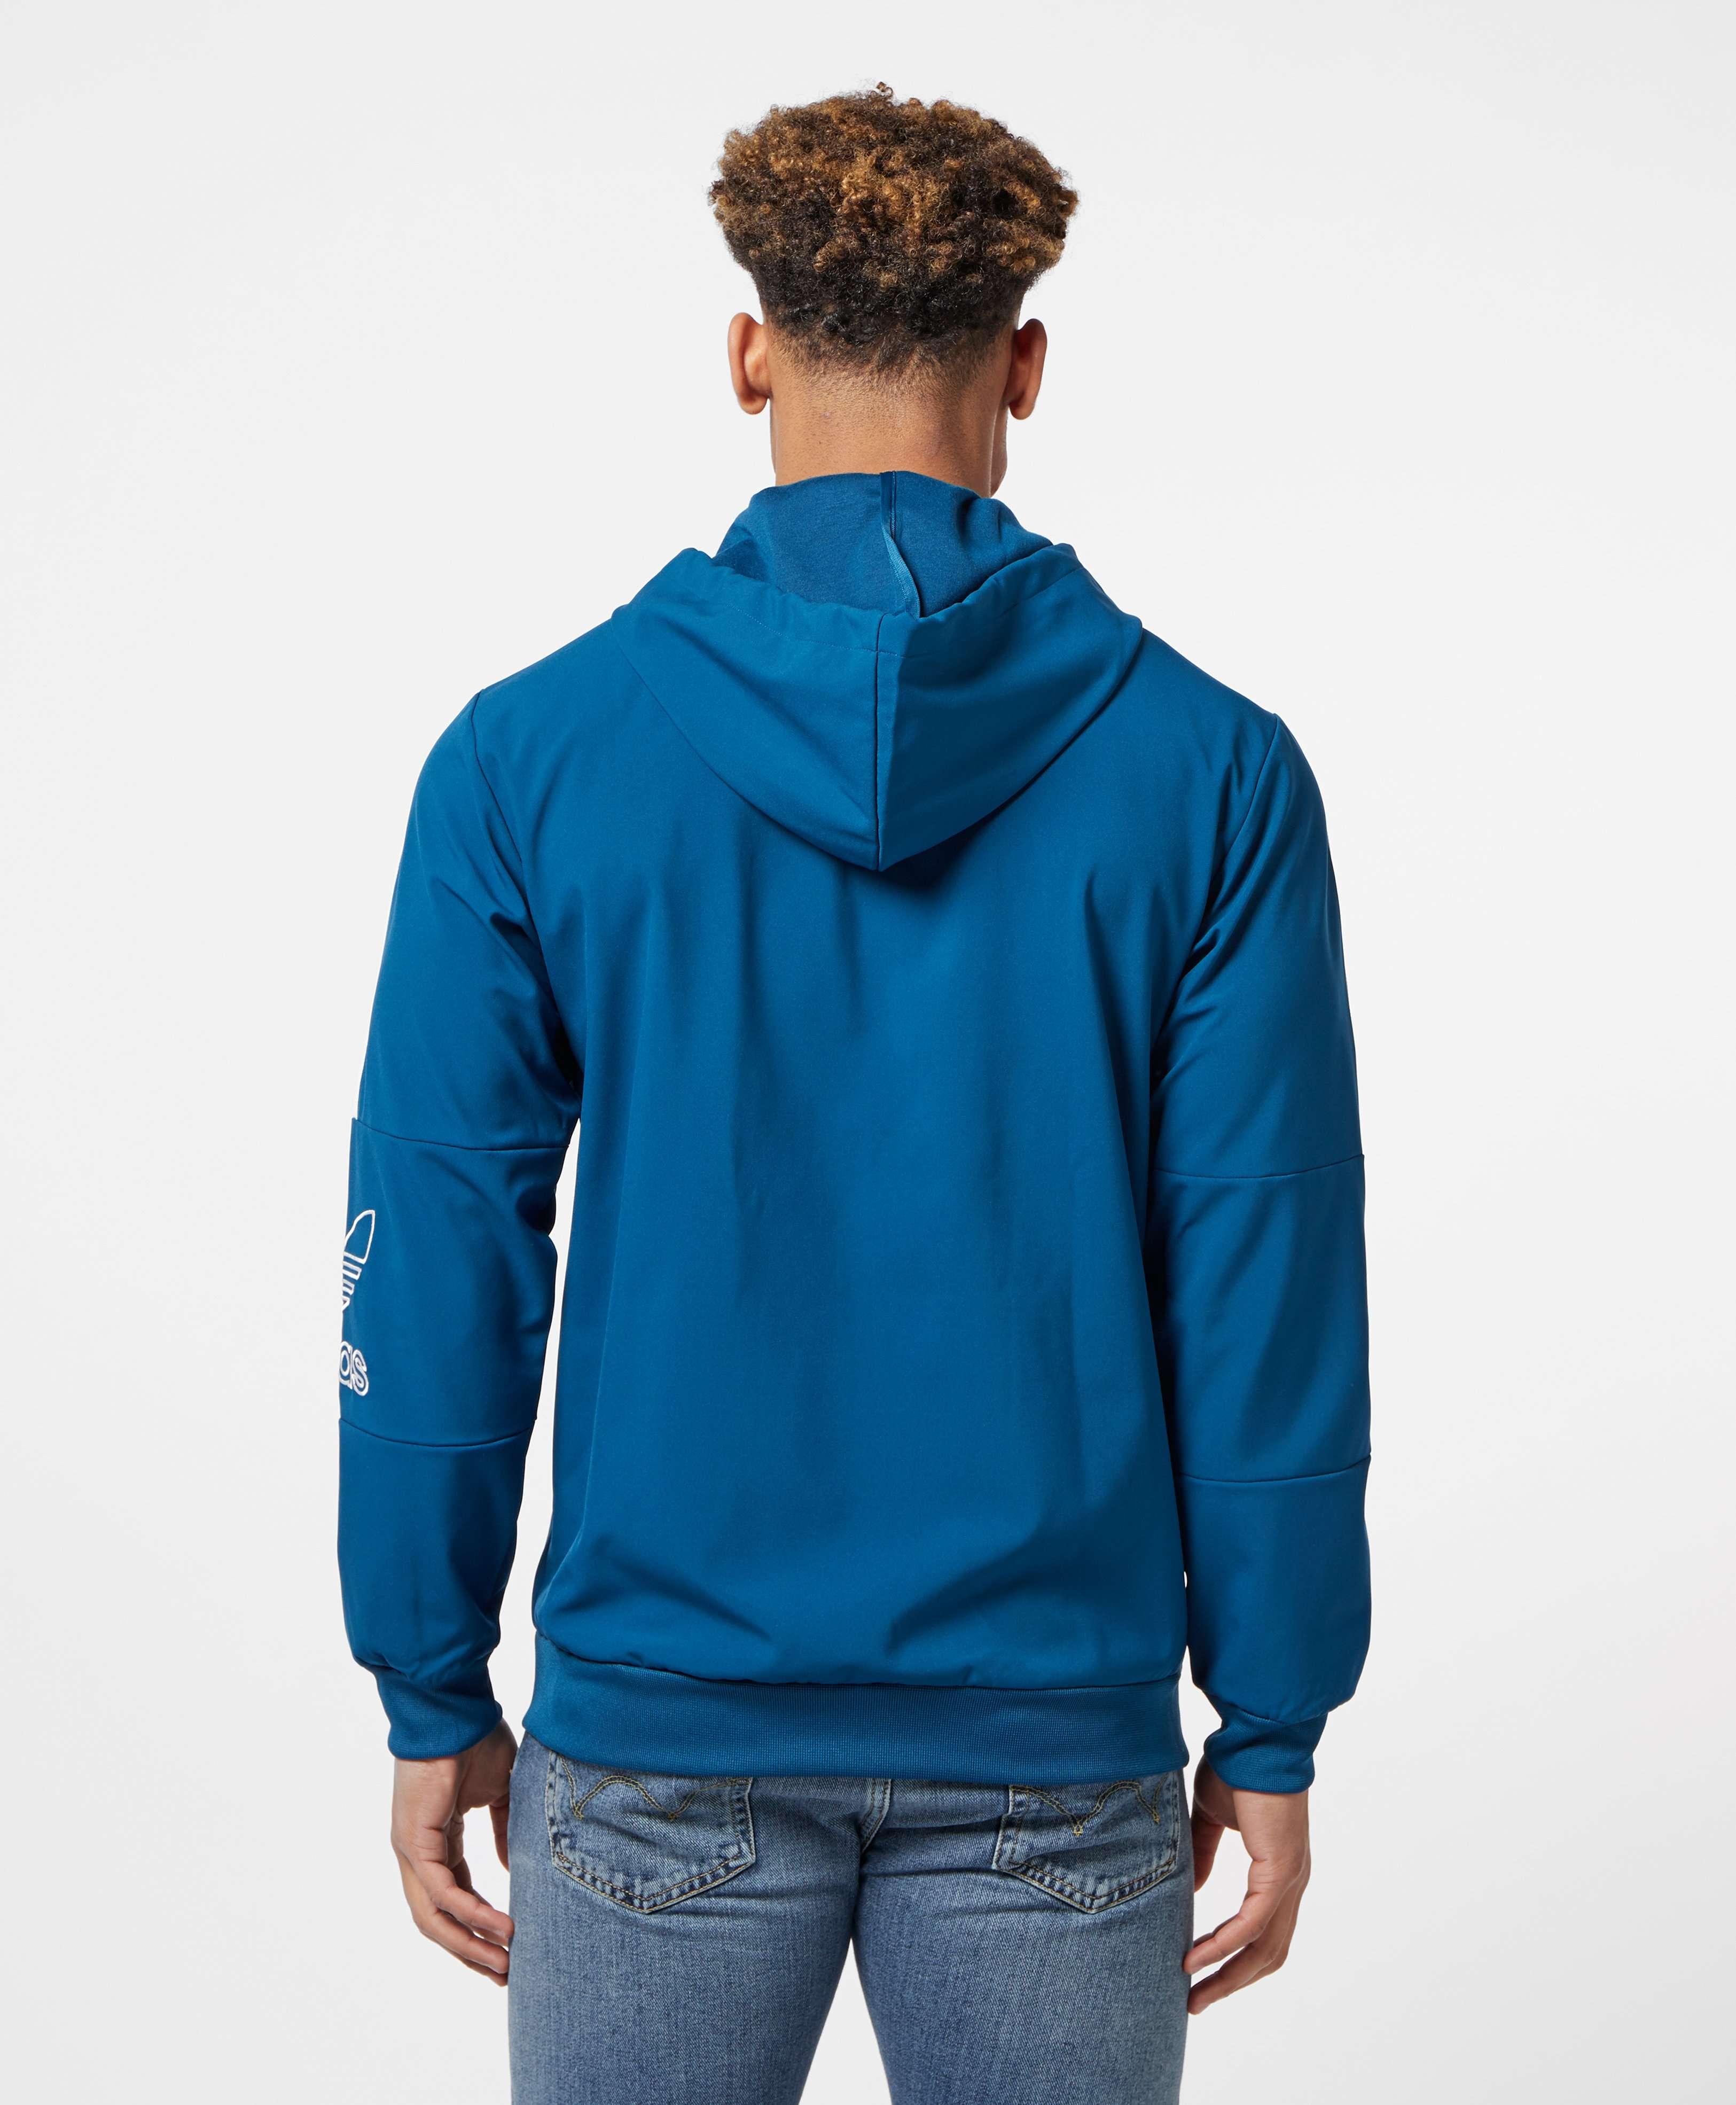 adidas Originals Trefoil Outline 2.0 Full Zip Hoodie